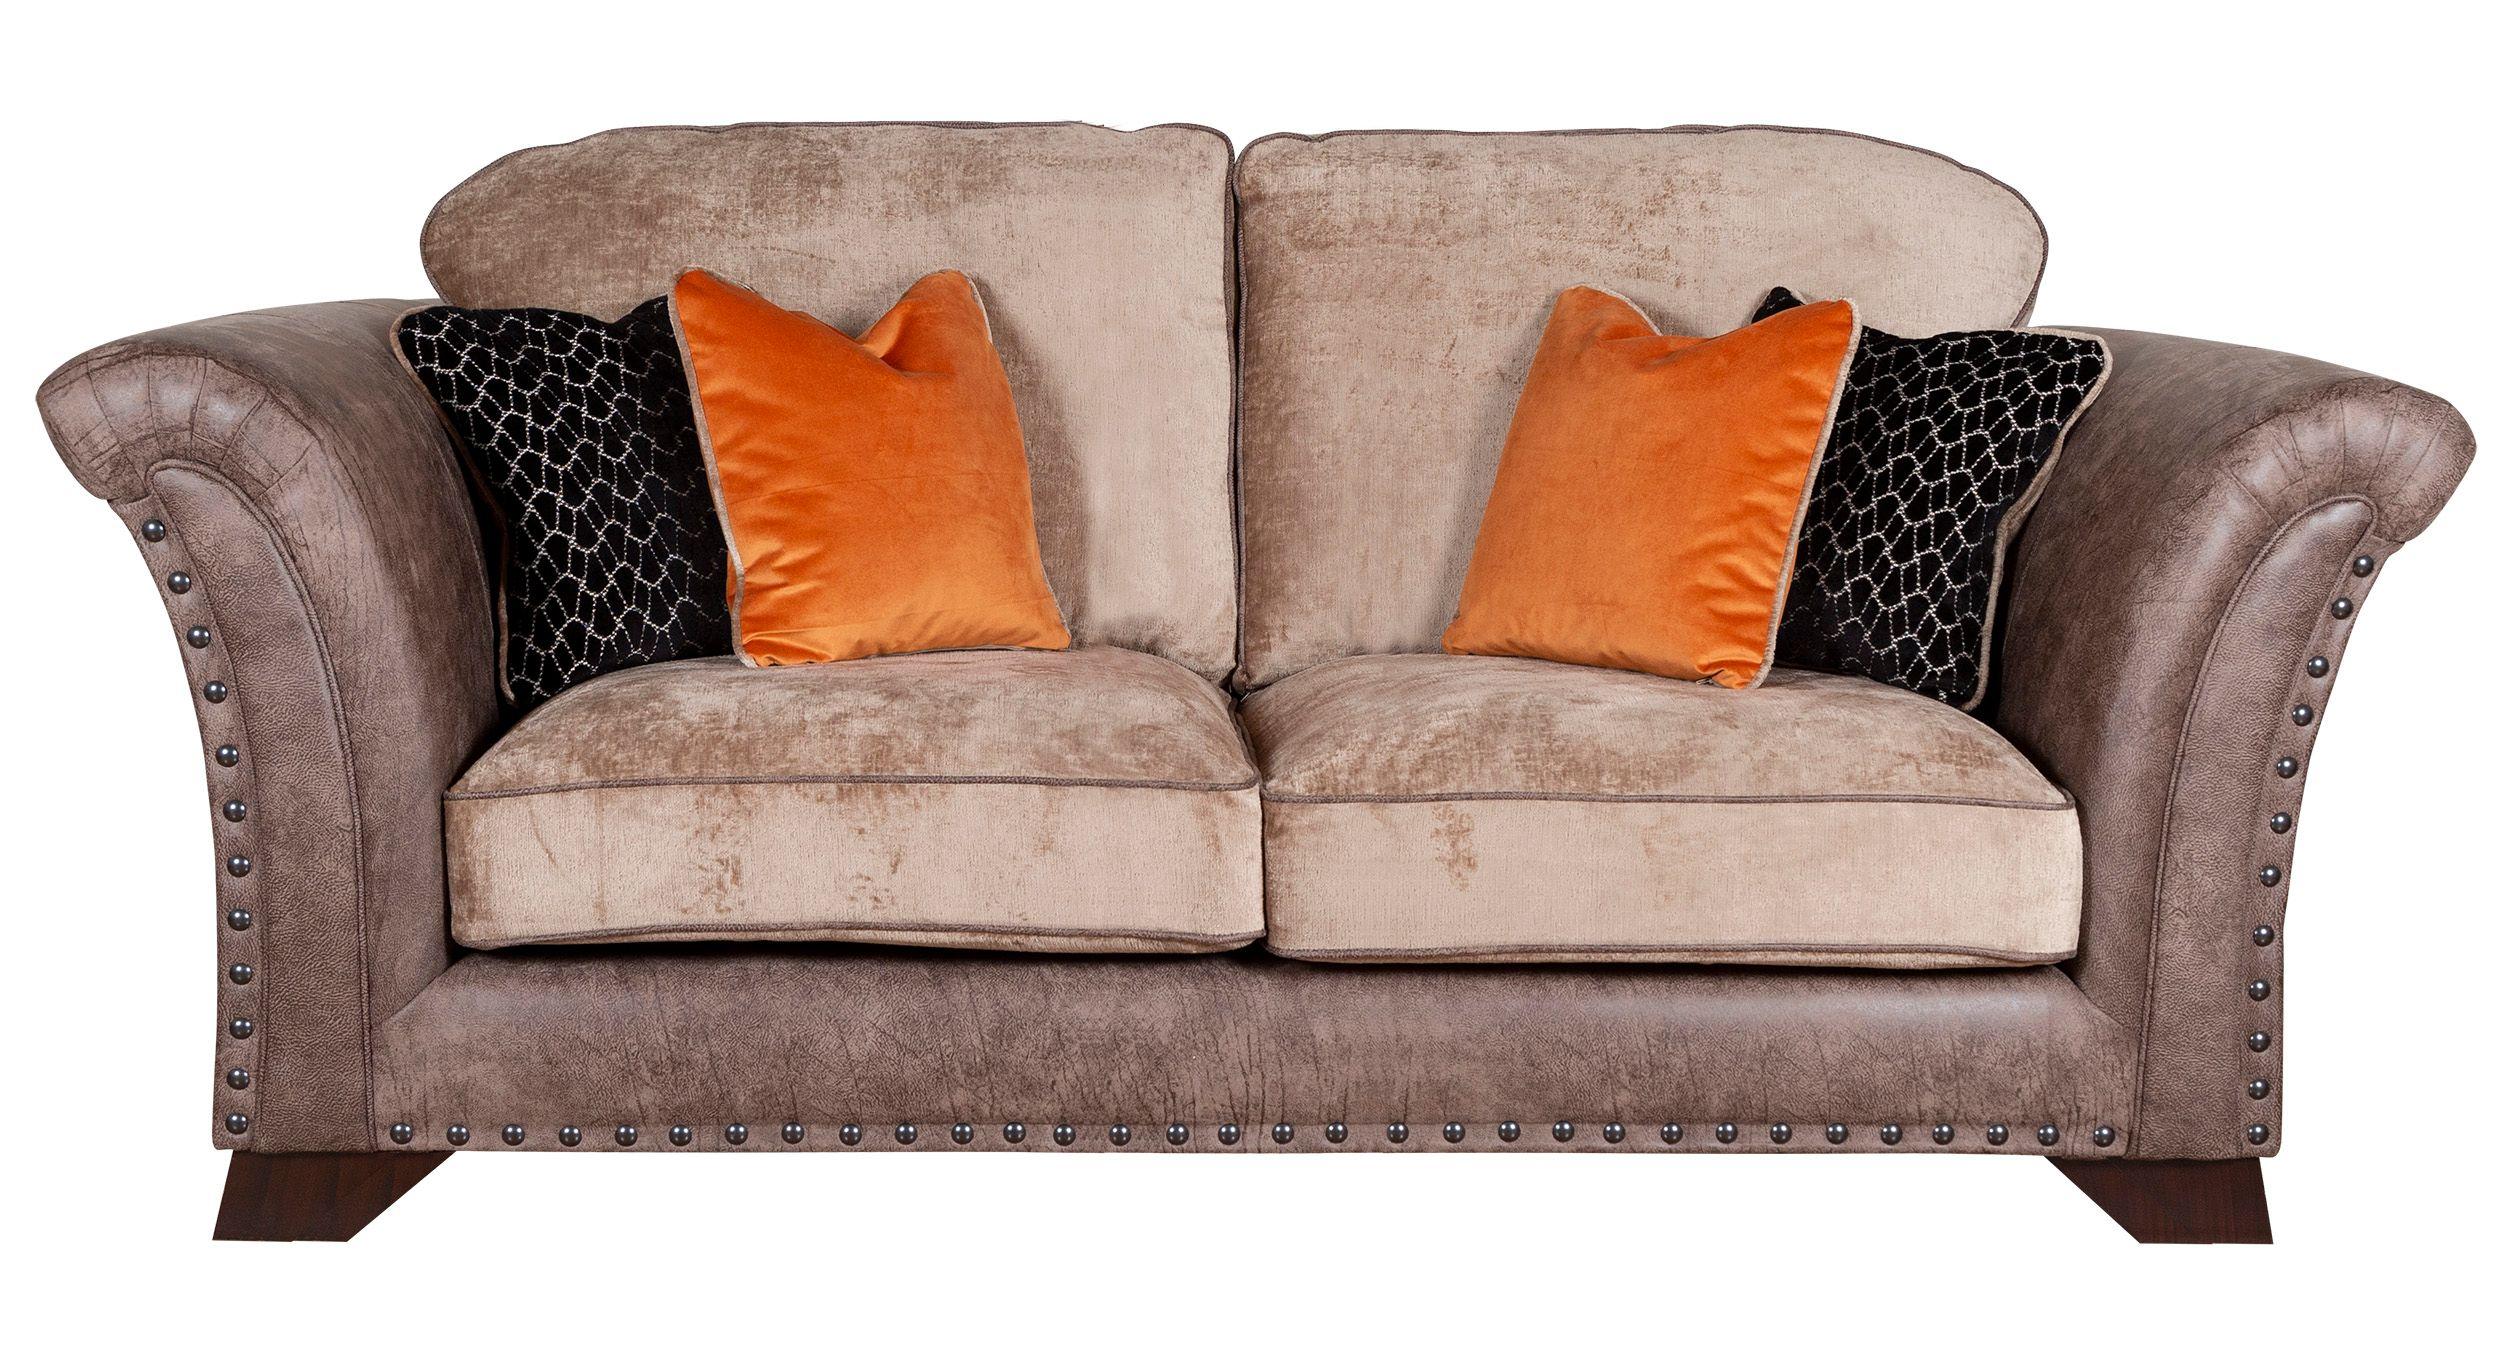 WESTMINSTER Standard Back 3 Seater Modular Sofa